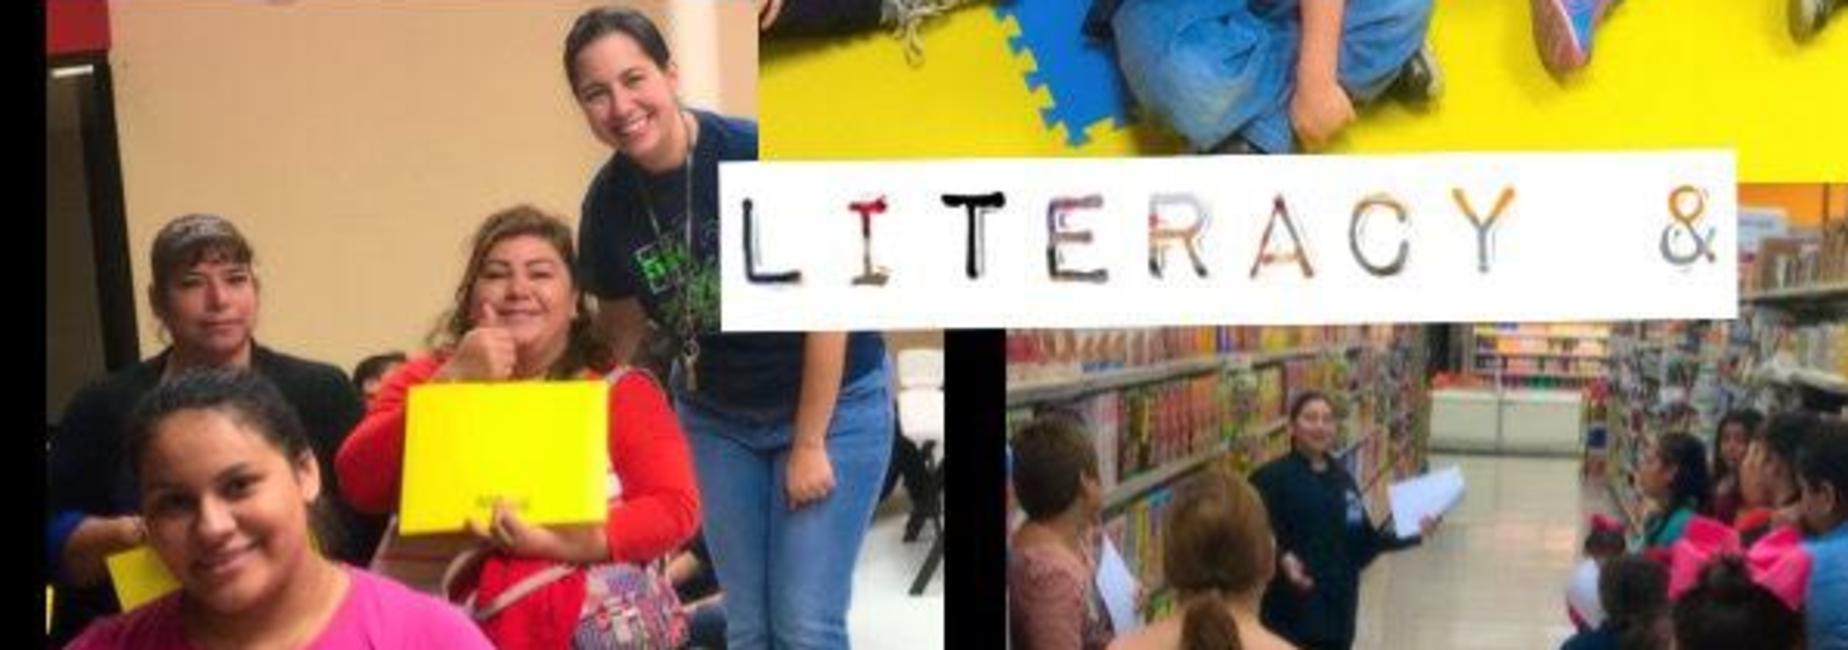 Parents participate in Literacy & Nutrition Program.